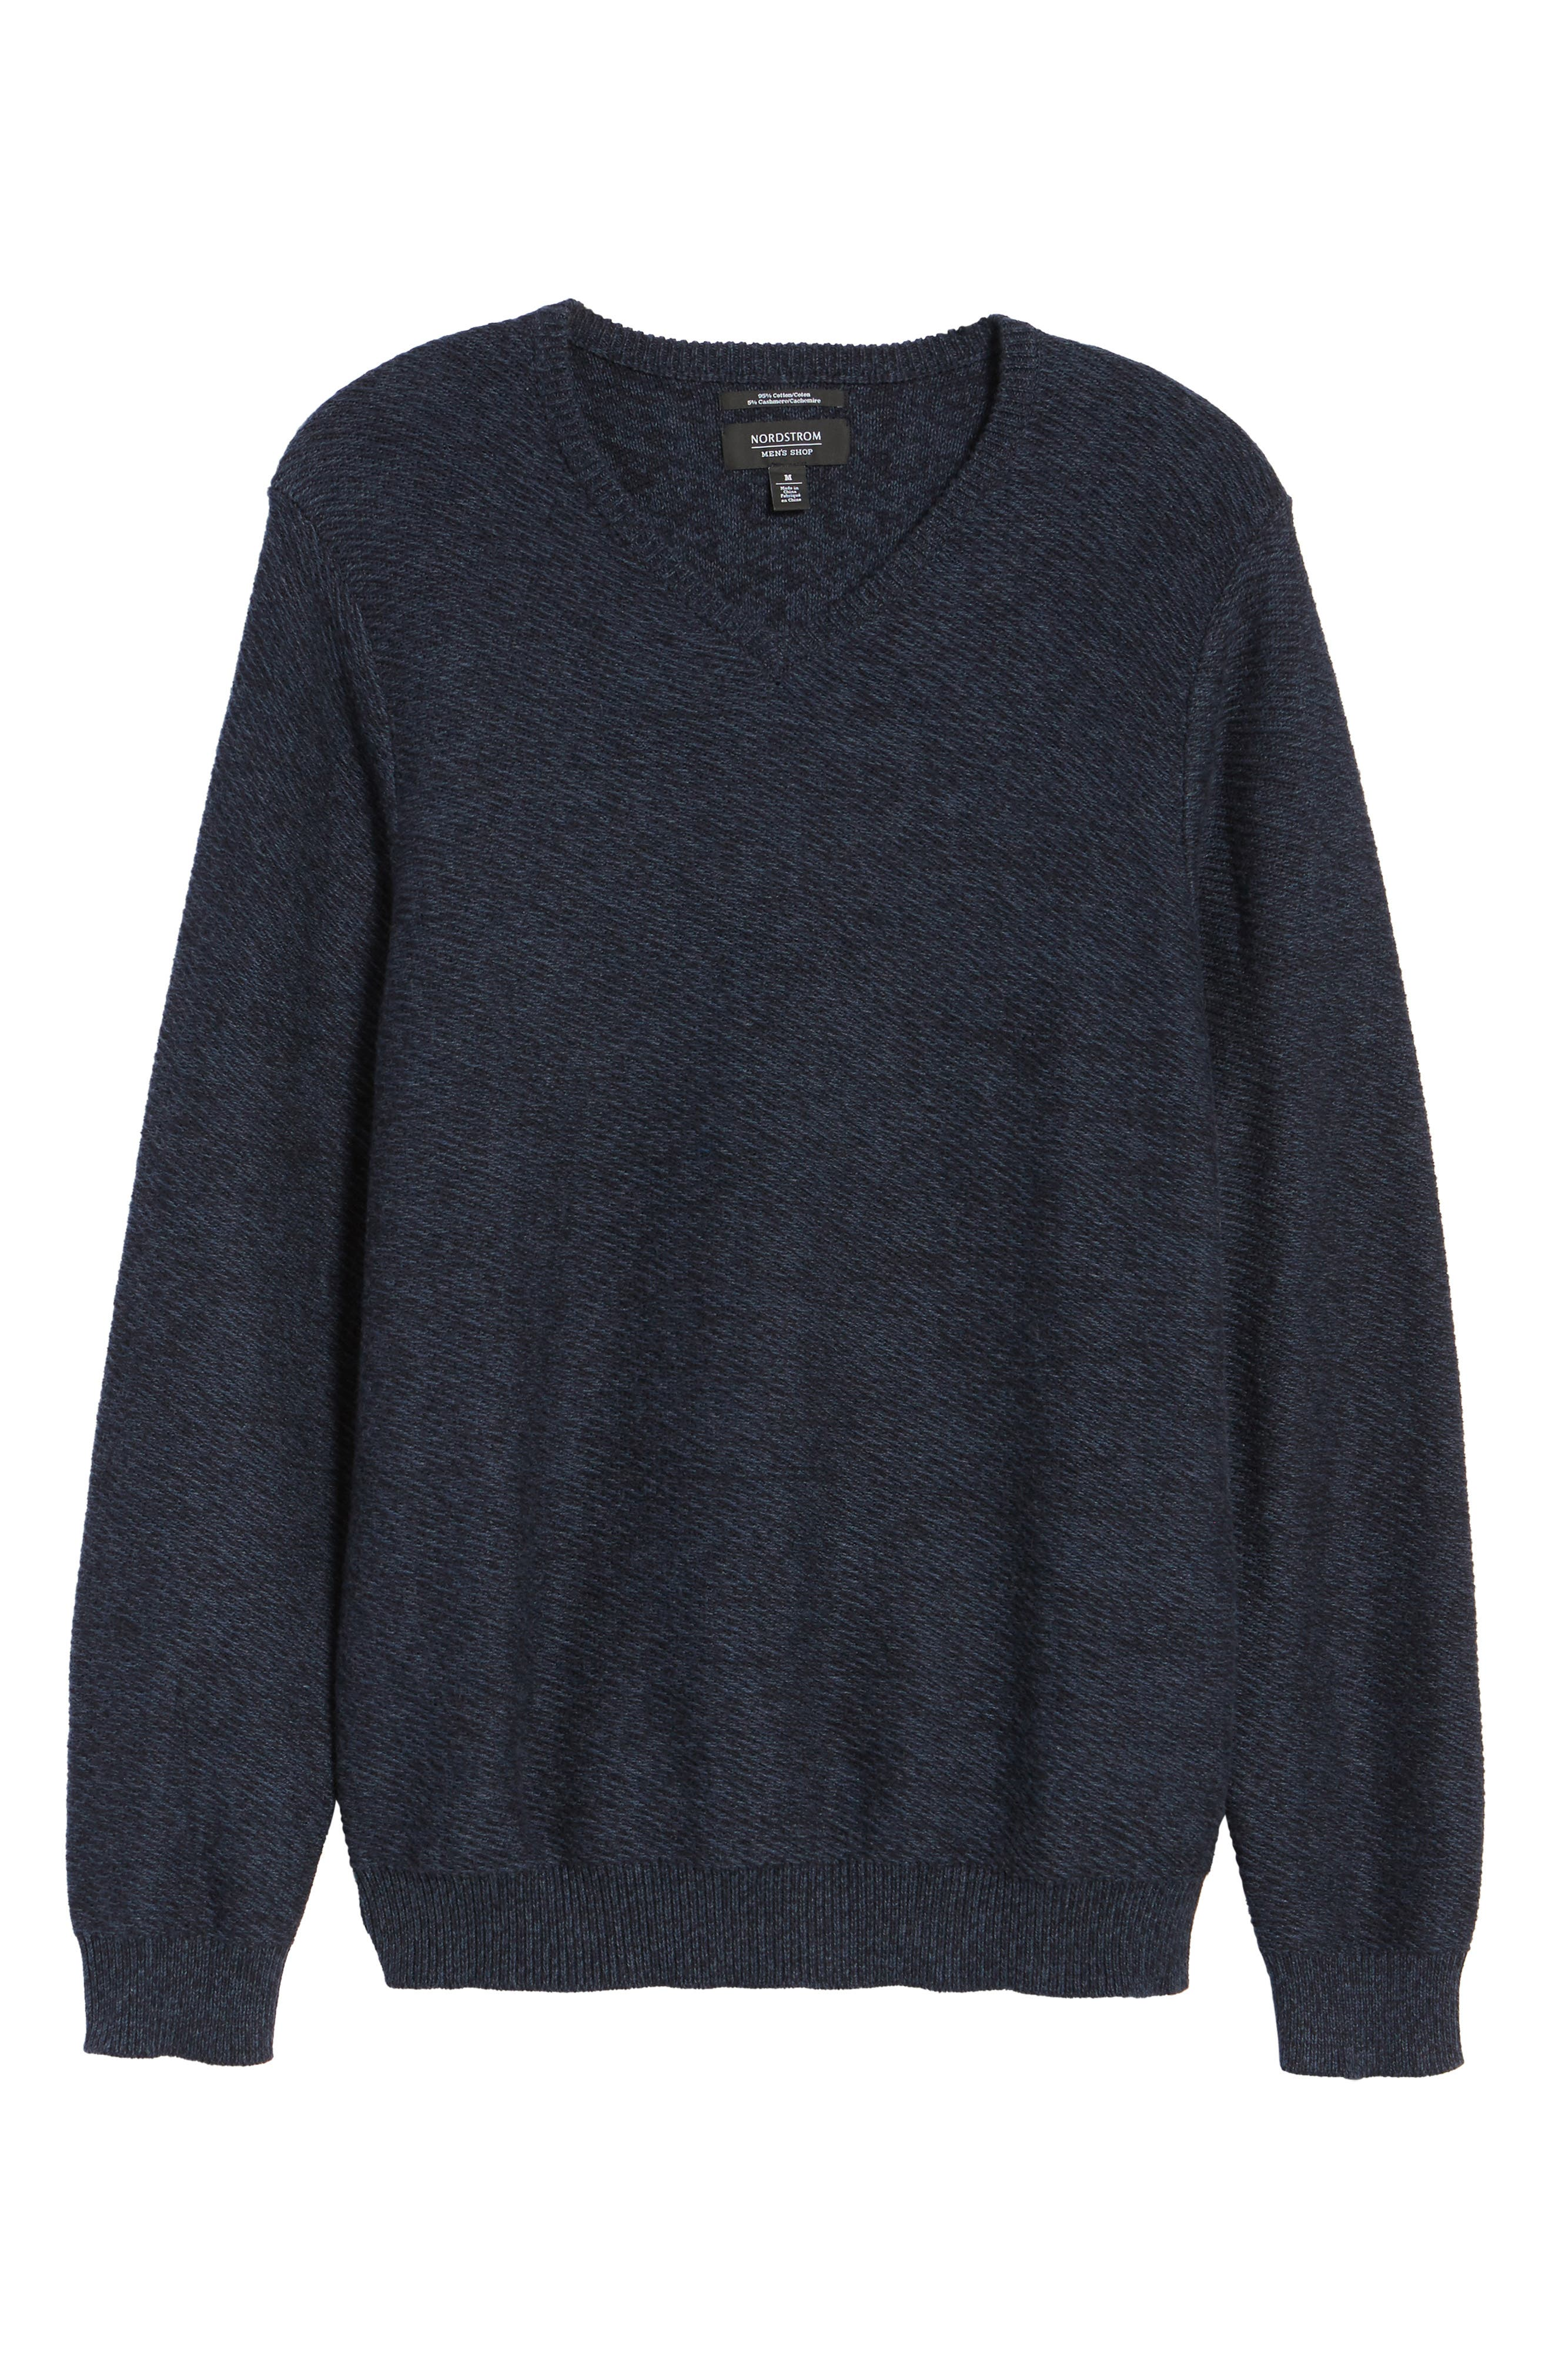 Cotton & Cashmere V-Neck Sweater,                             Alternate thumbnail 7, color,                             Navy Iris Melange